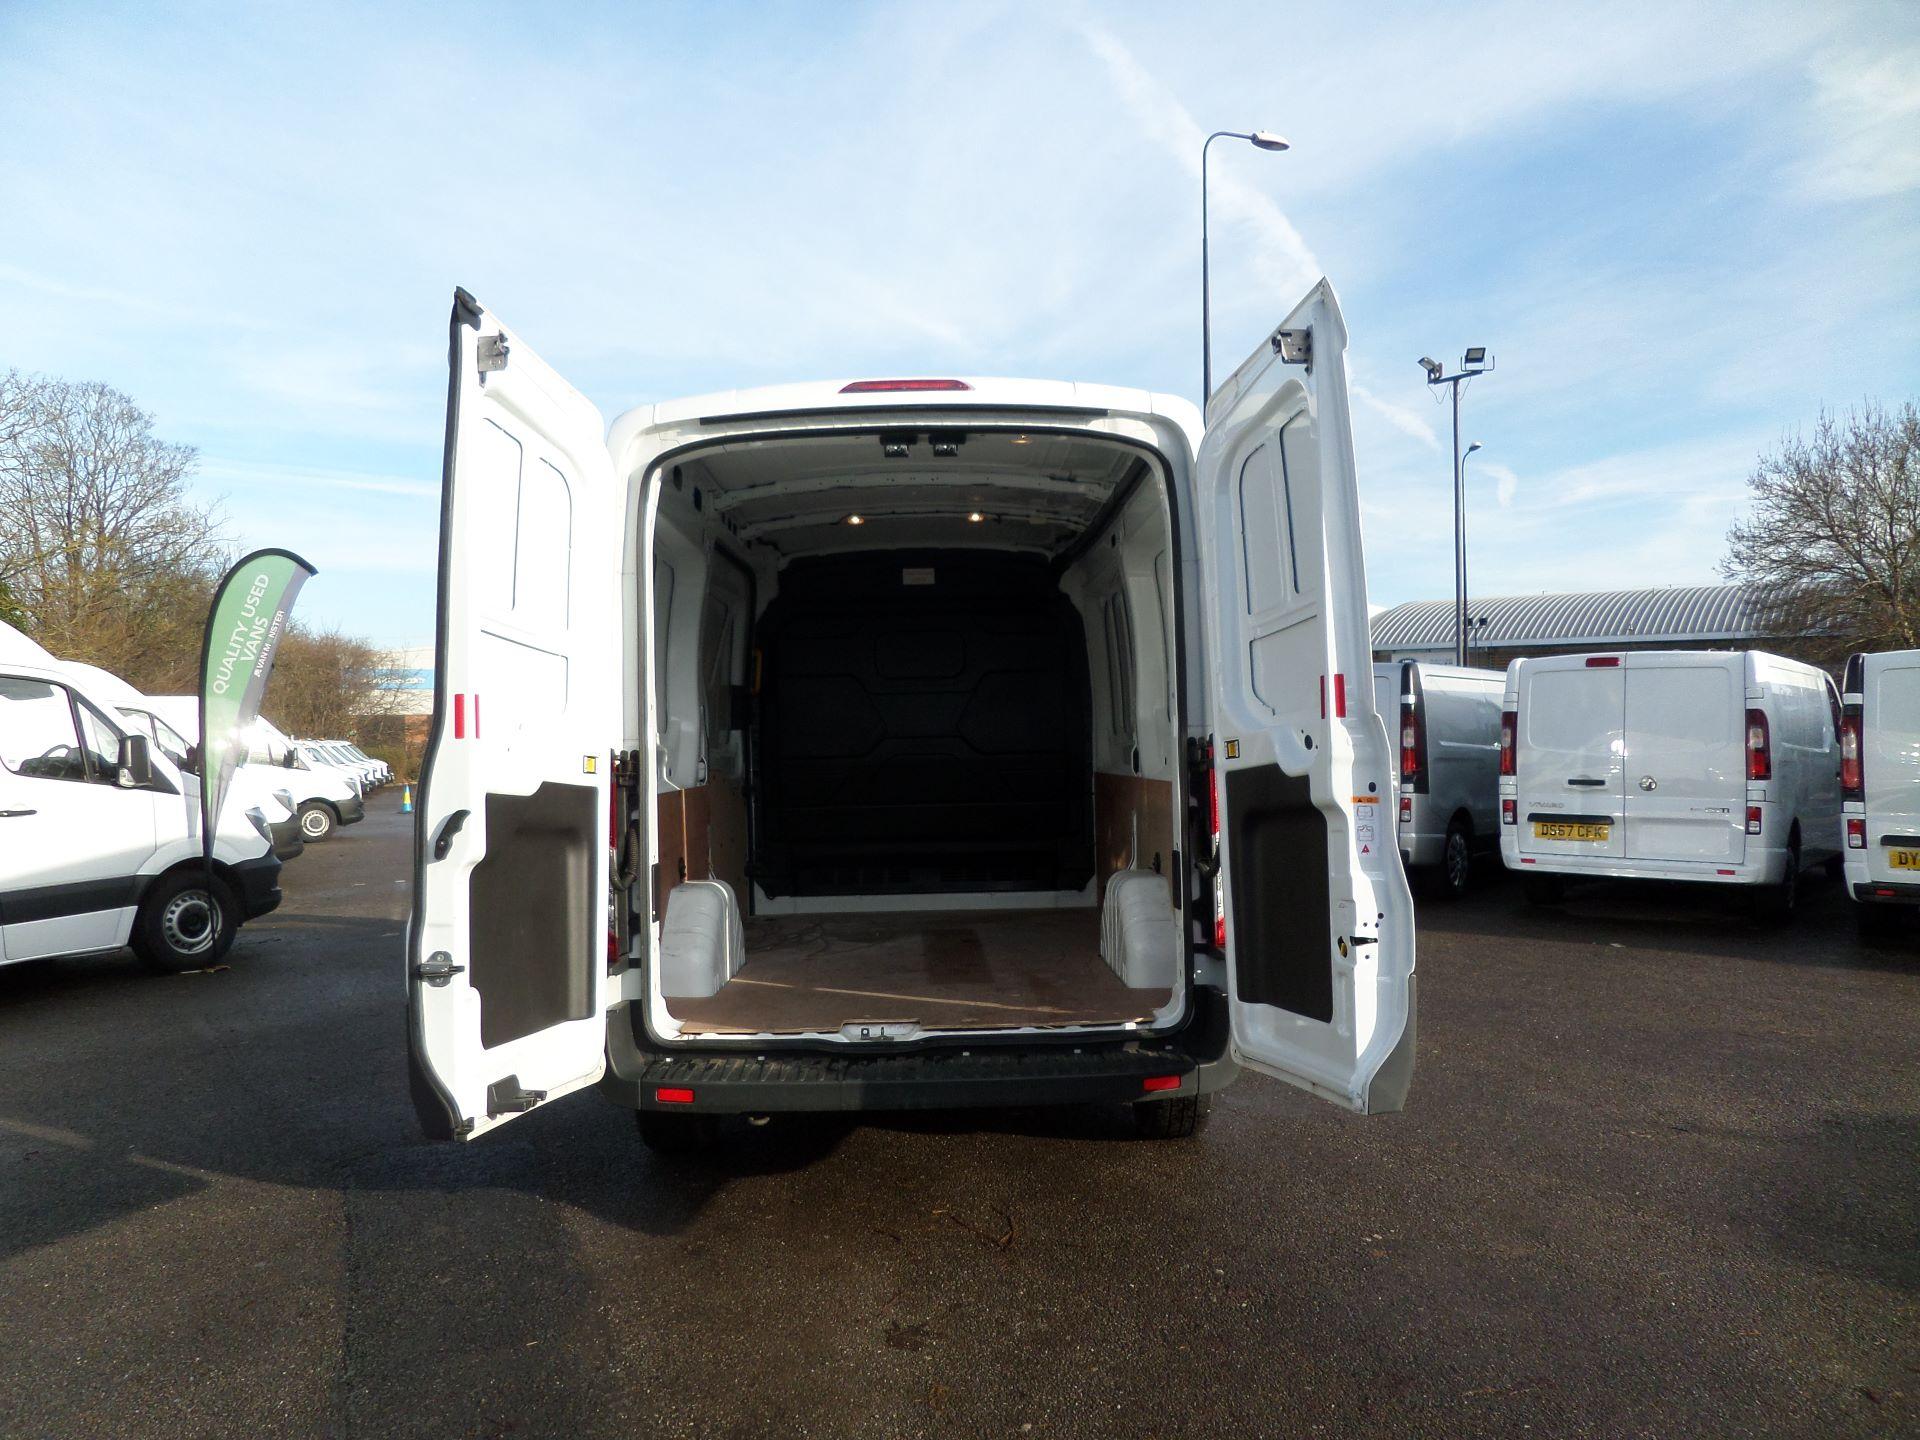 2018 Ford Transit 2.0 Tdci 130Ps H2/L2 Van Euro 6 (FE18JGO) Image 4